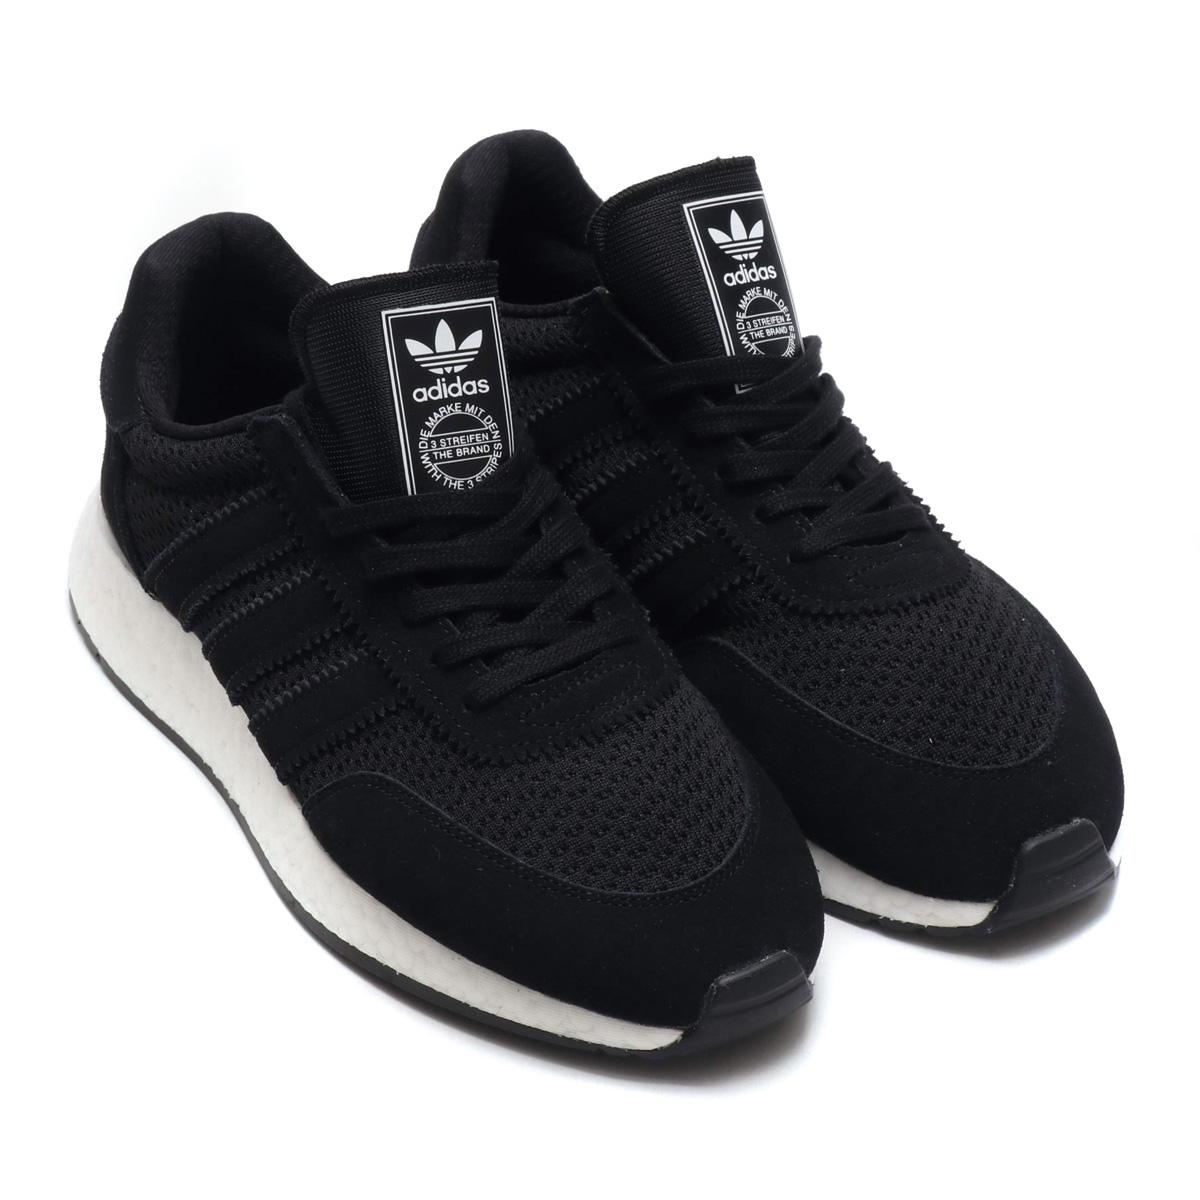 8b5c9e8f  adidas I-5923 (Adidas I-5923) core black core black 0bc6241  running ... b3c38ac11